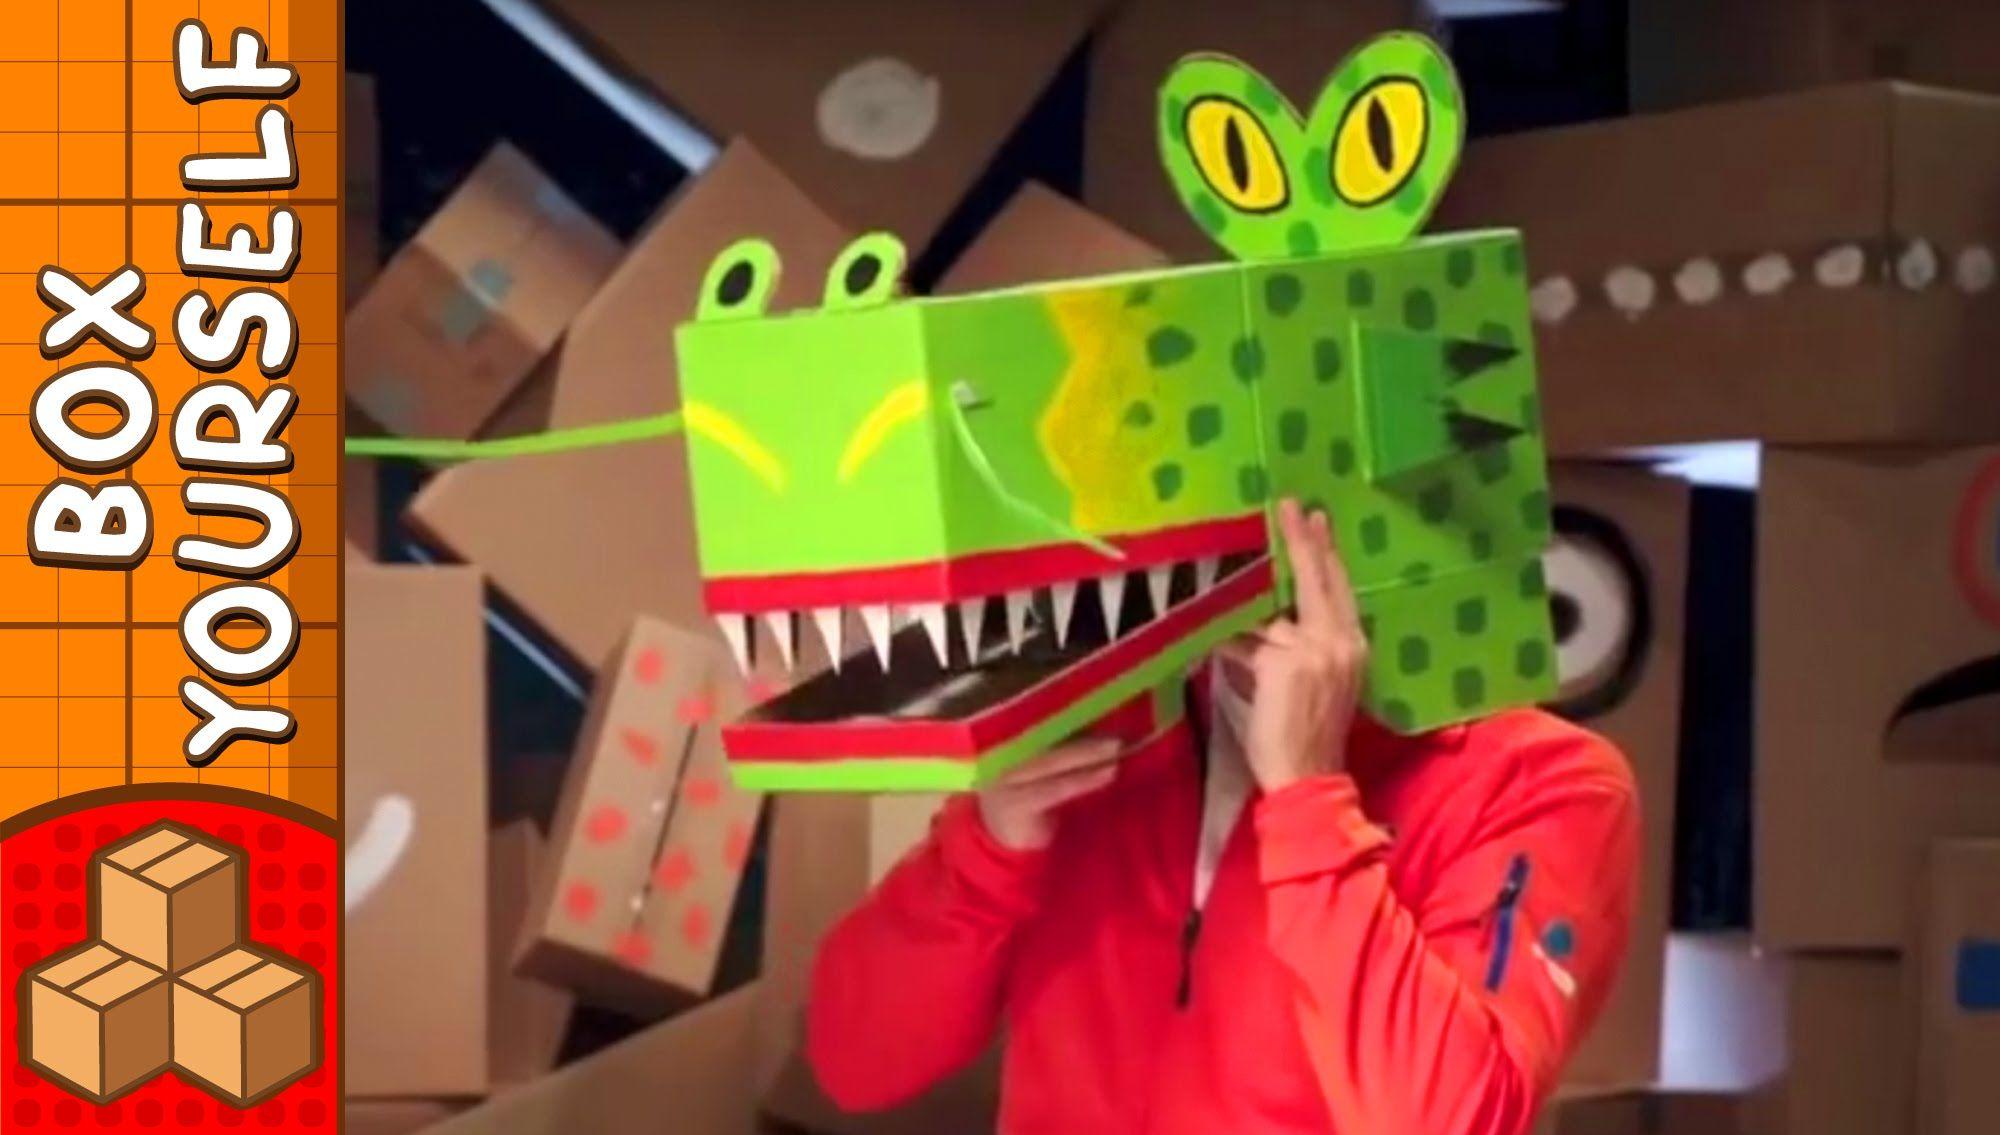 Cardboard Dragon Mask Crafts Ideas For Kids Diy On Boxyourself Diy For Kids Masks Crafts Mask For Kids